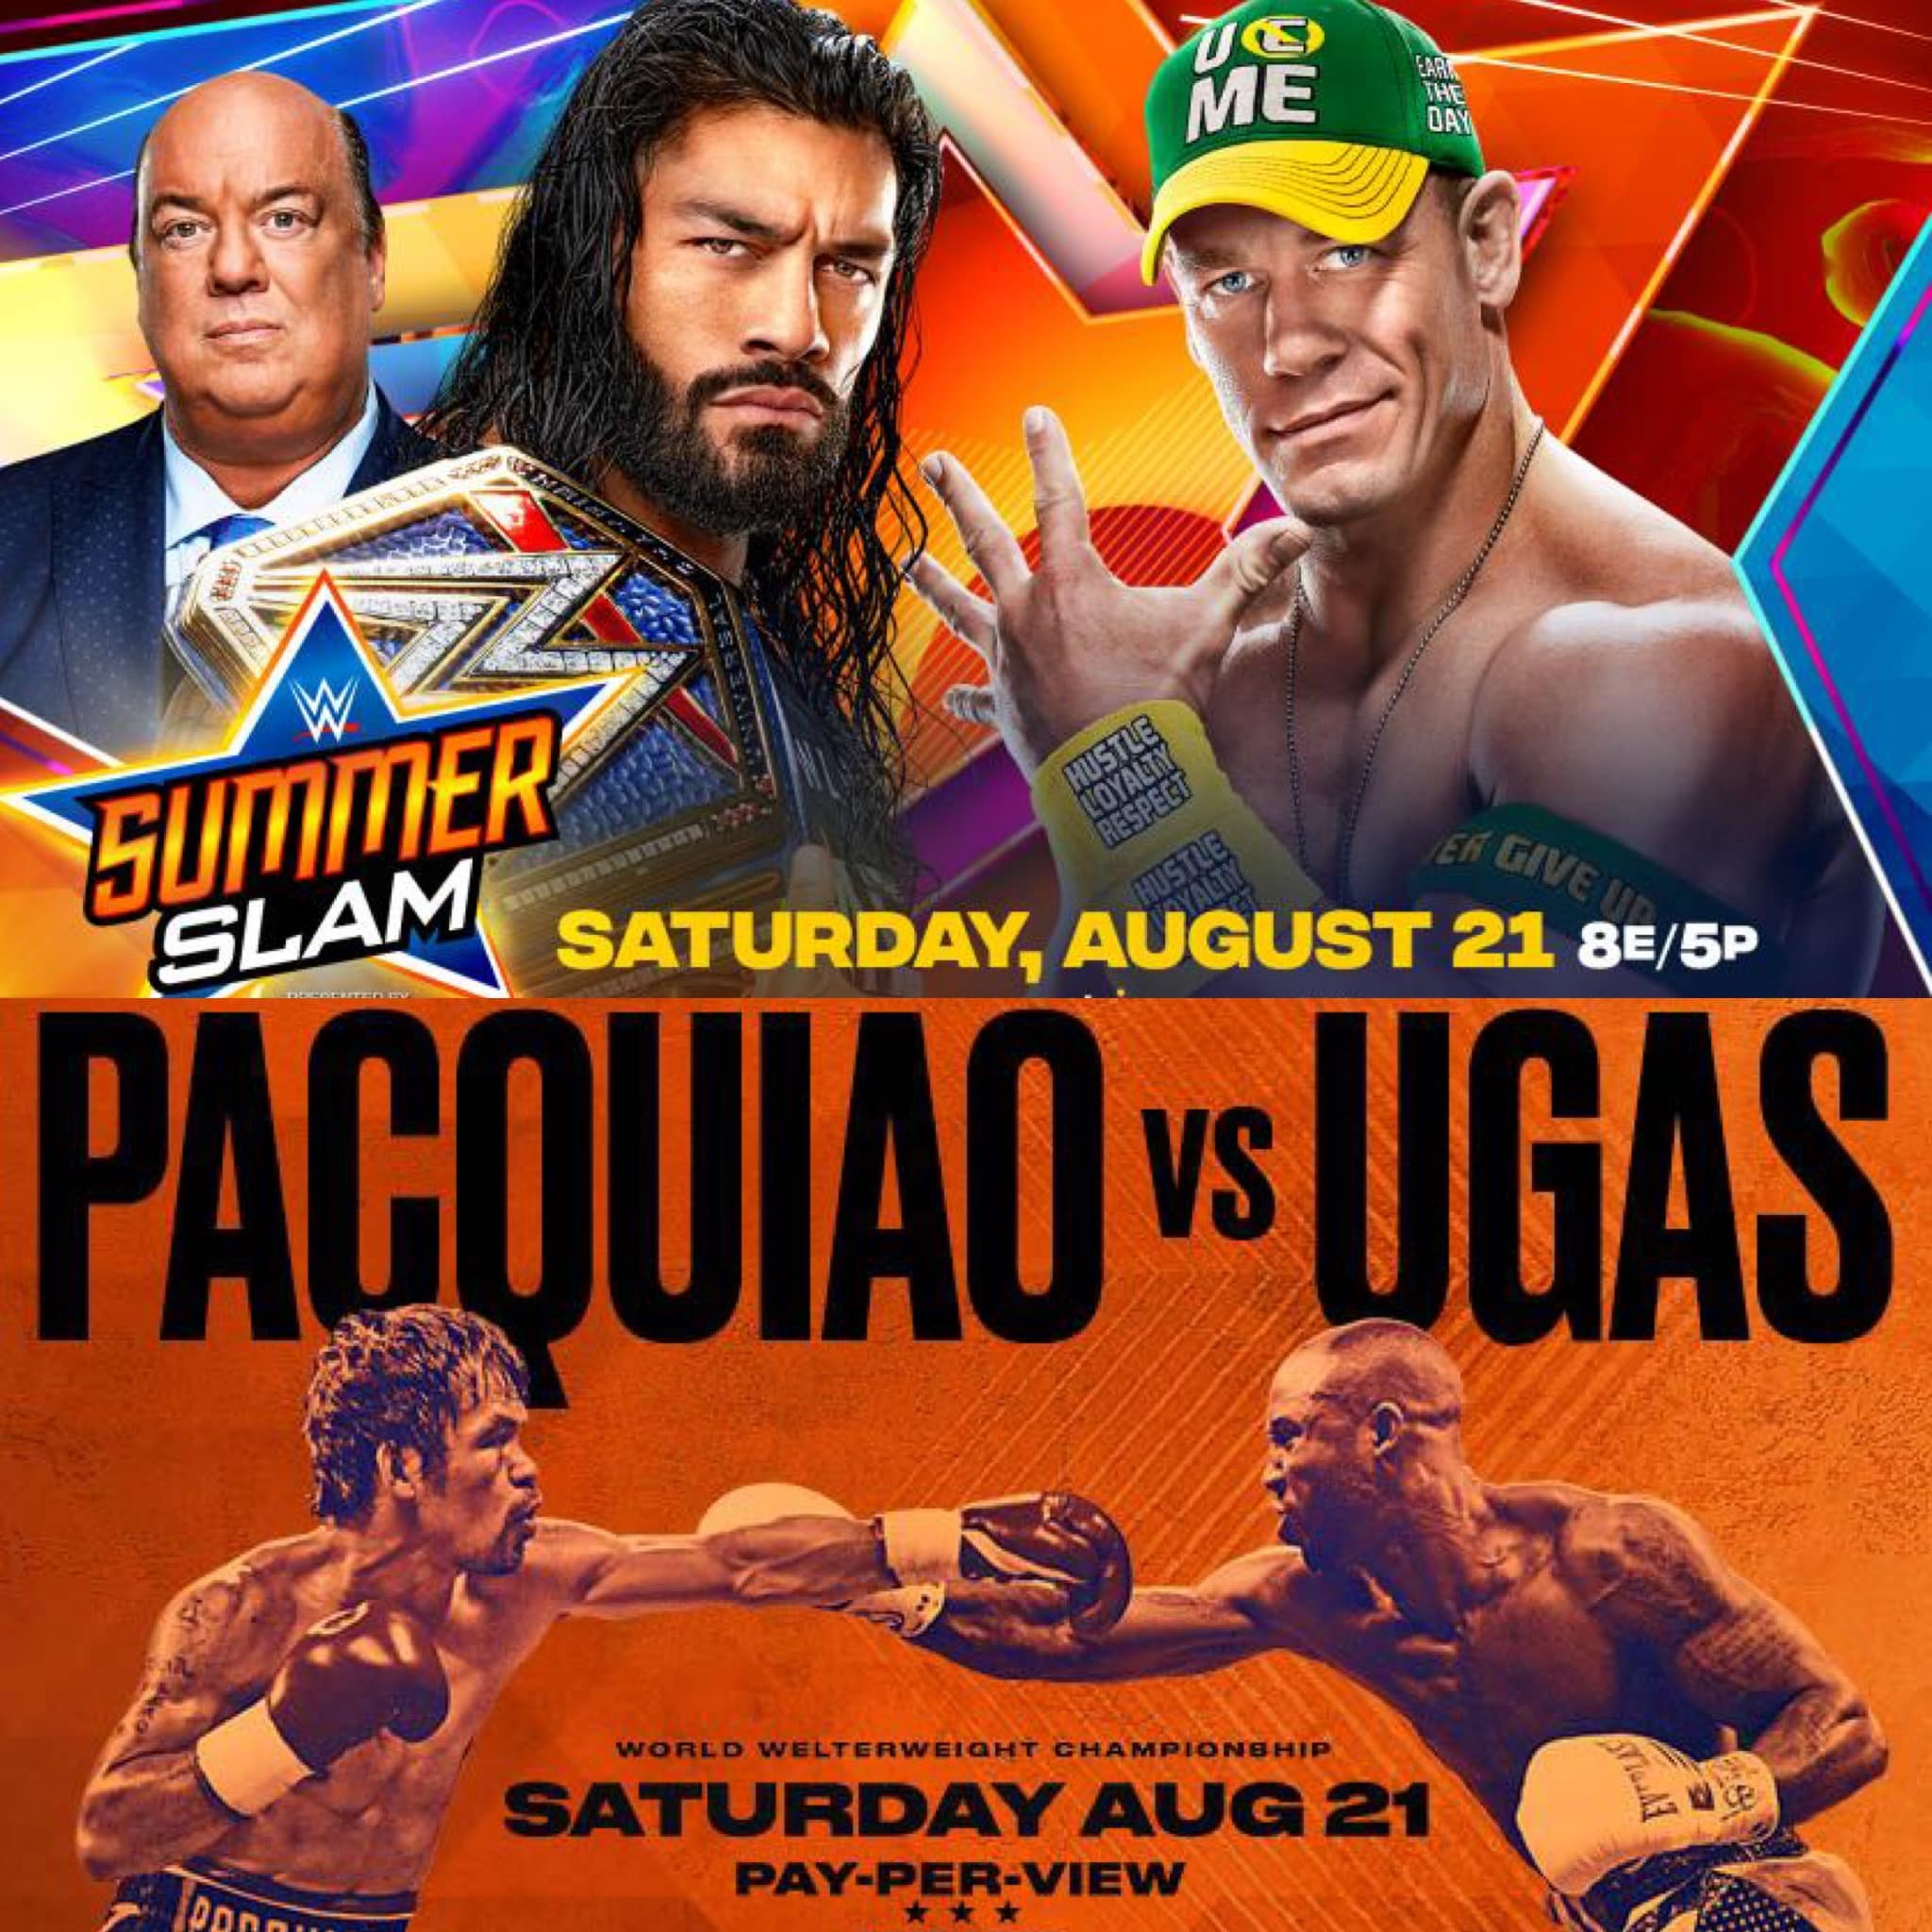 Pacquiao vs Ugas + WWE SummerSlam - Reigns vs Cena | The Fight Show (Ep. 44)